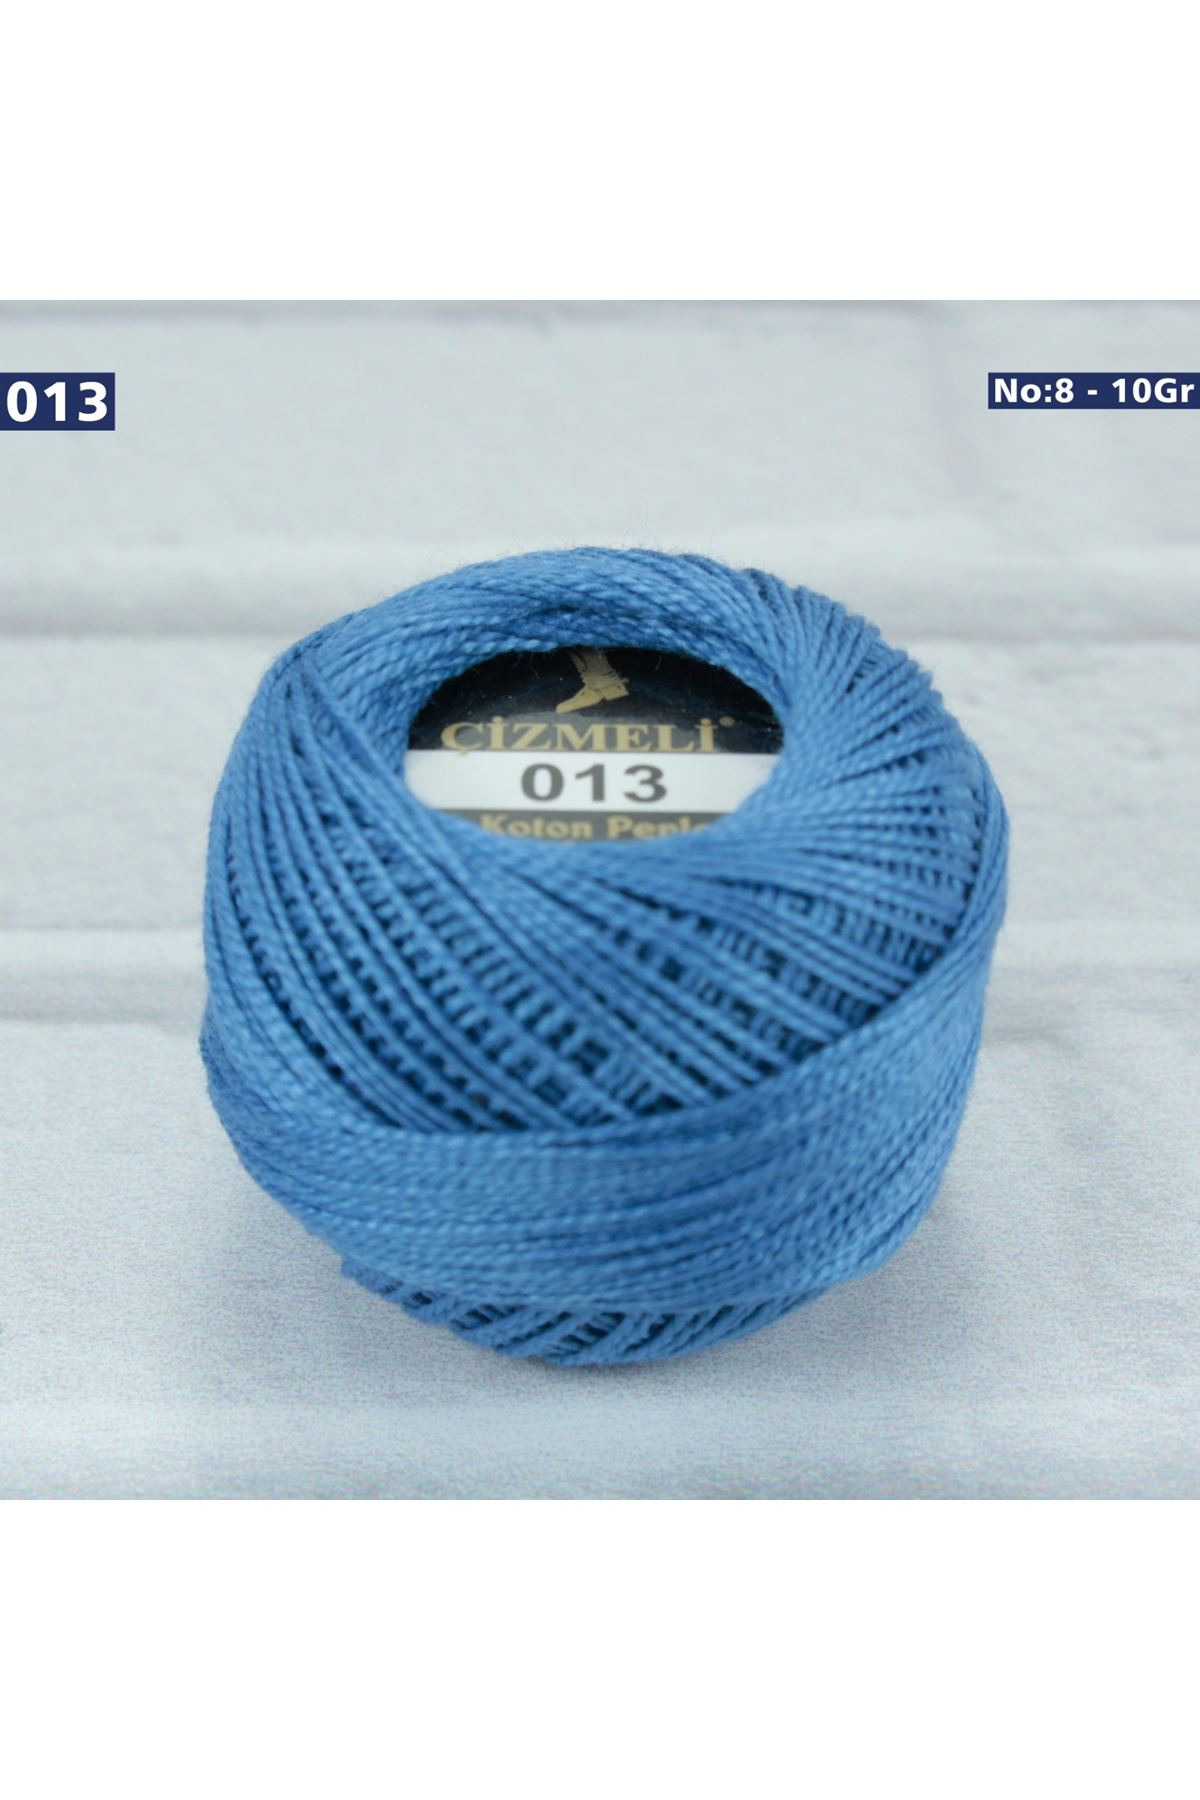 Çizmeli Cotton Perle Nakış İpliği No: 013